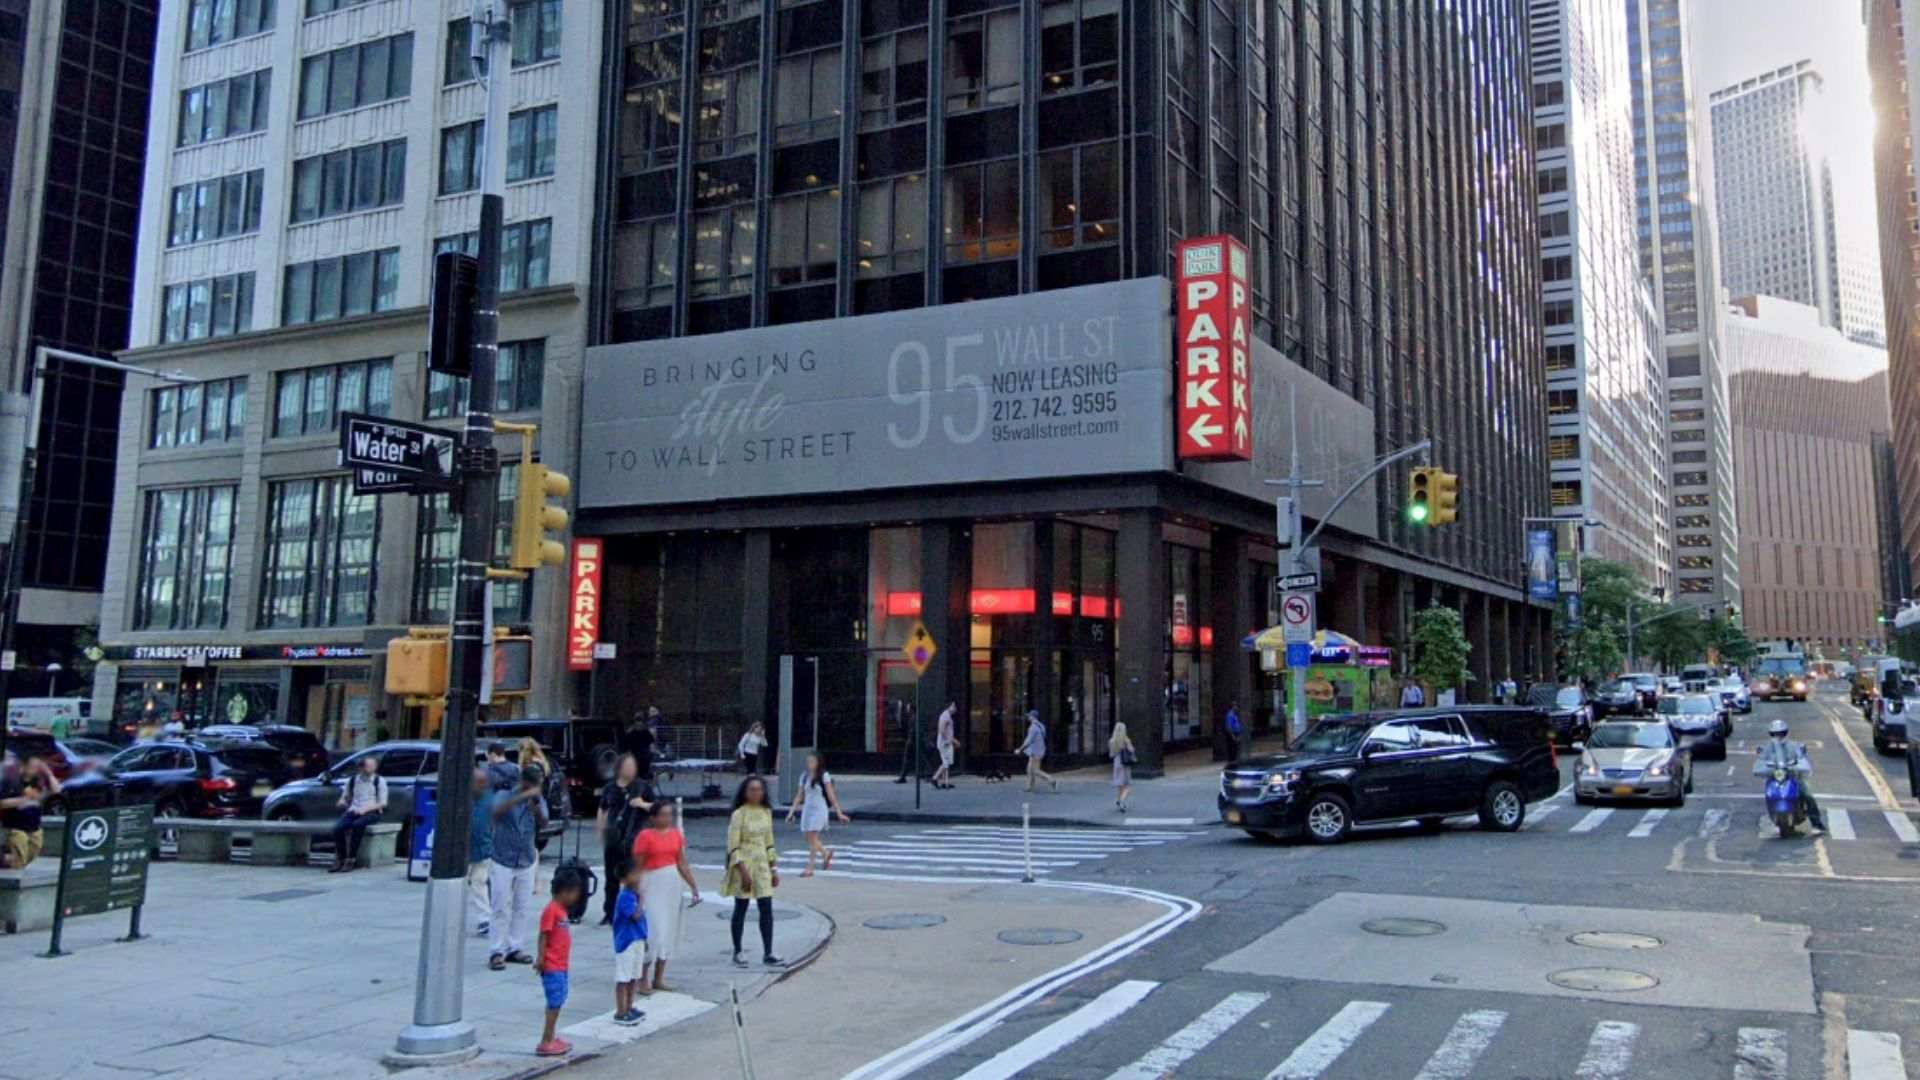 95 Wall Street in Manhattan, New York City